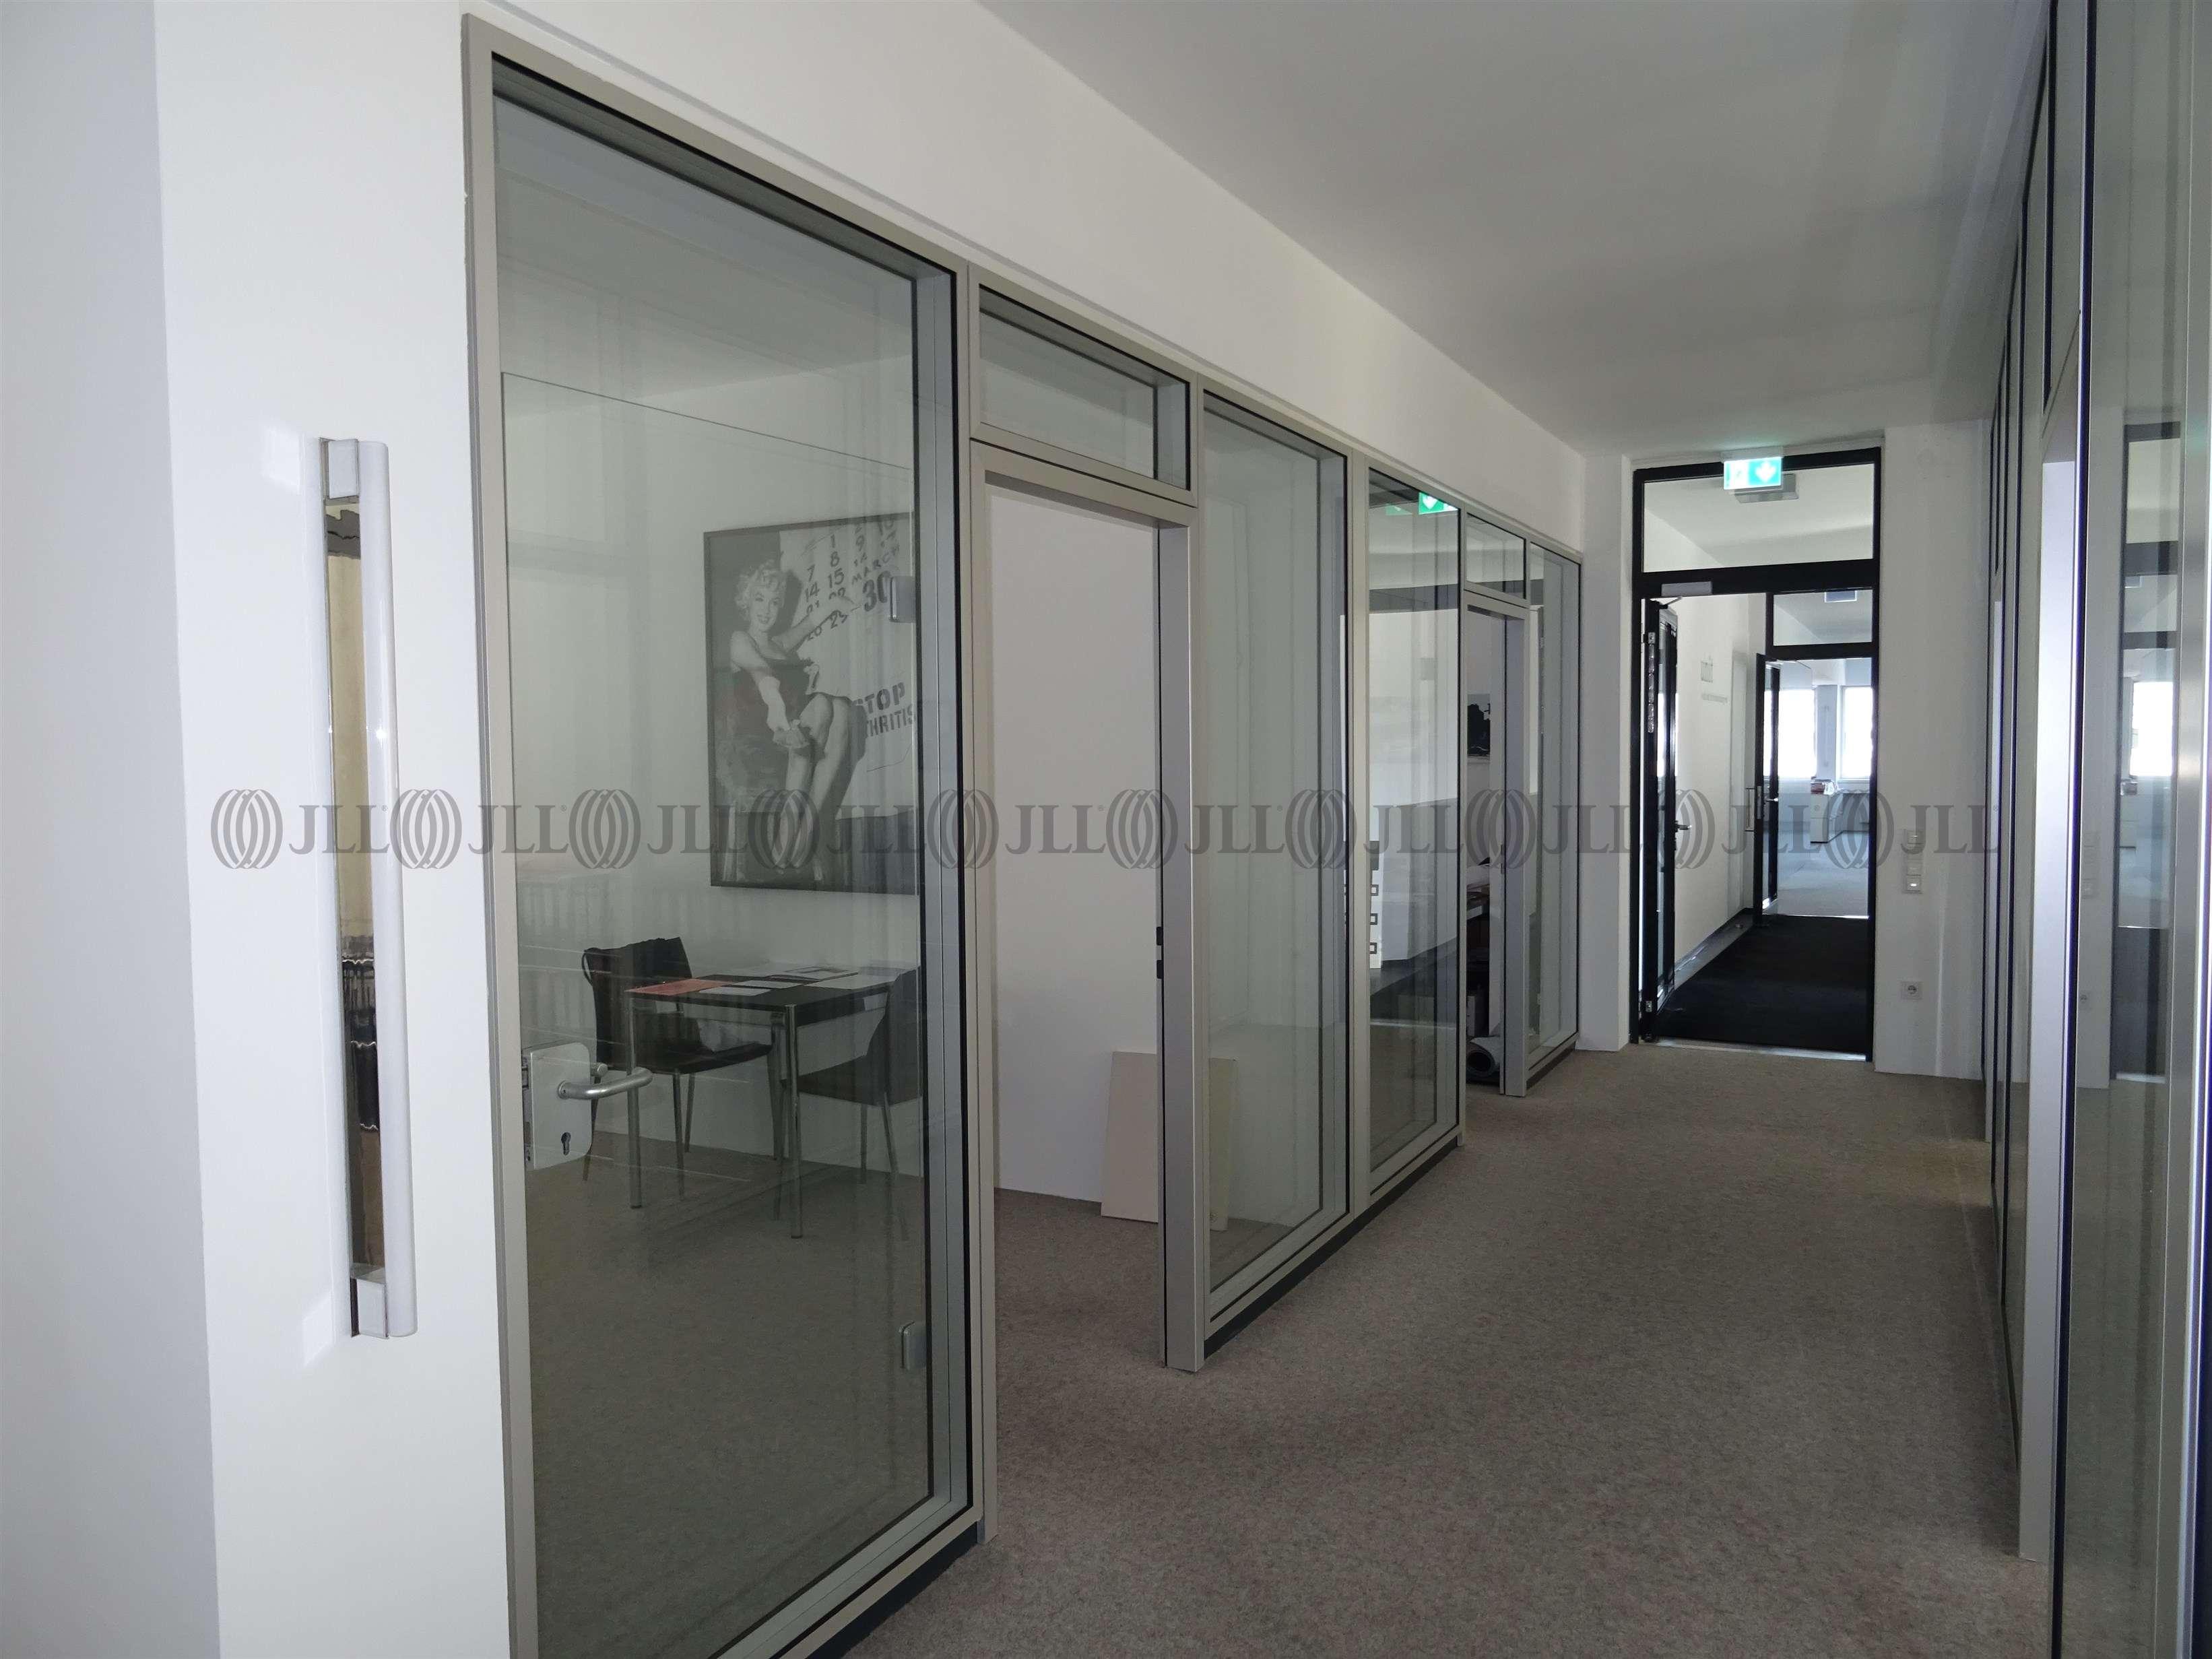 Büros Darmstadt, 64283 - Büro - Darmstadt - F1118 - 10057708